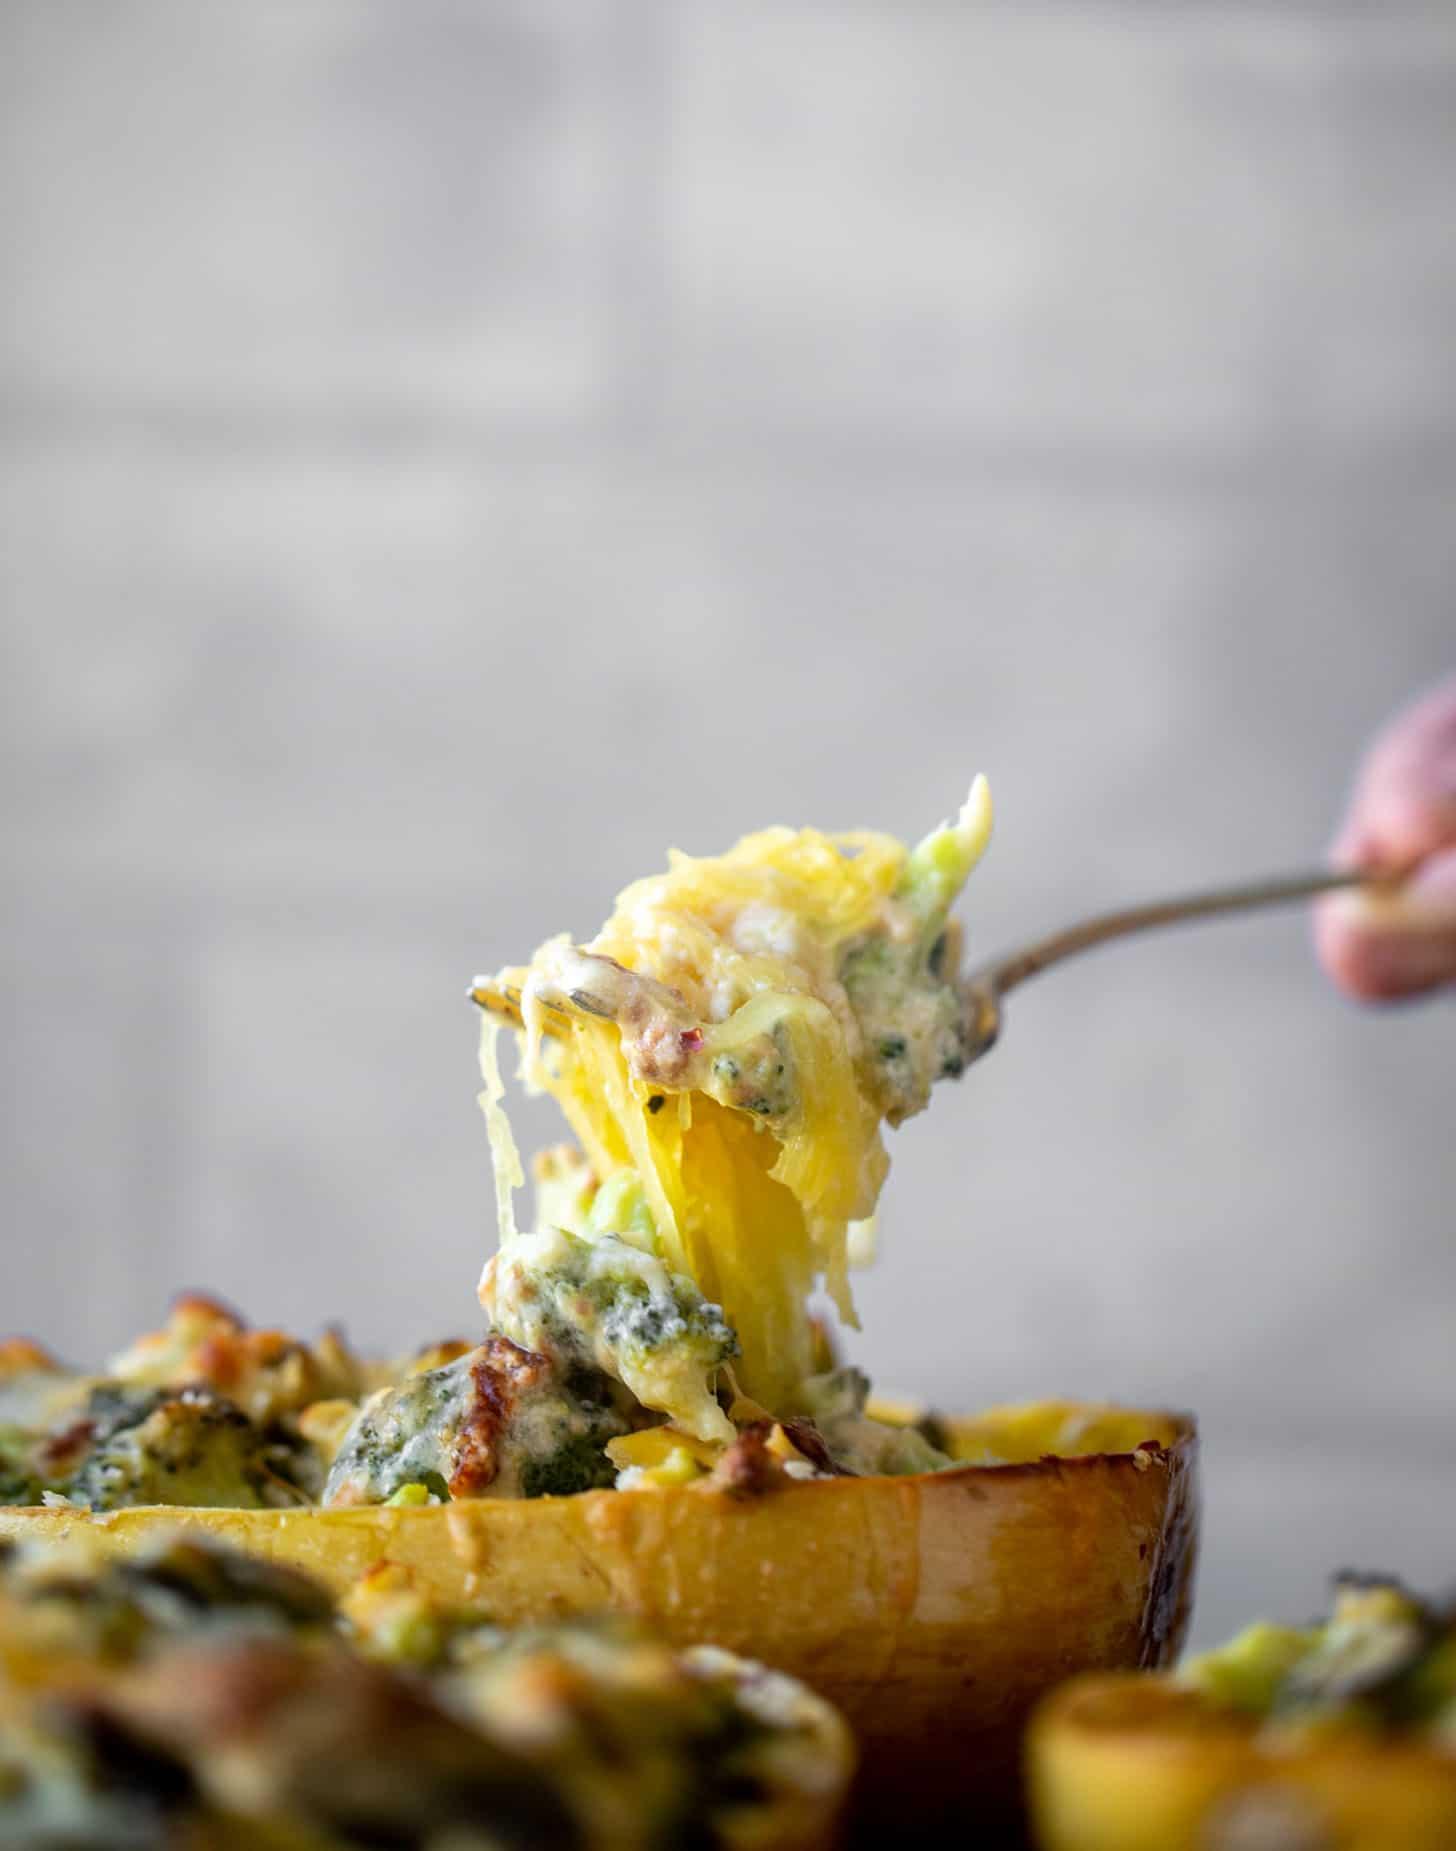 calabaza espagueti rellena de queso cheddar con brócoli